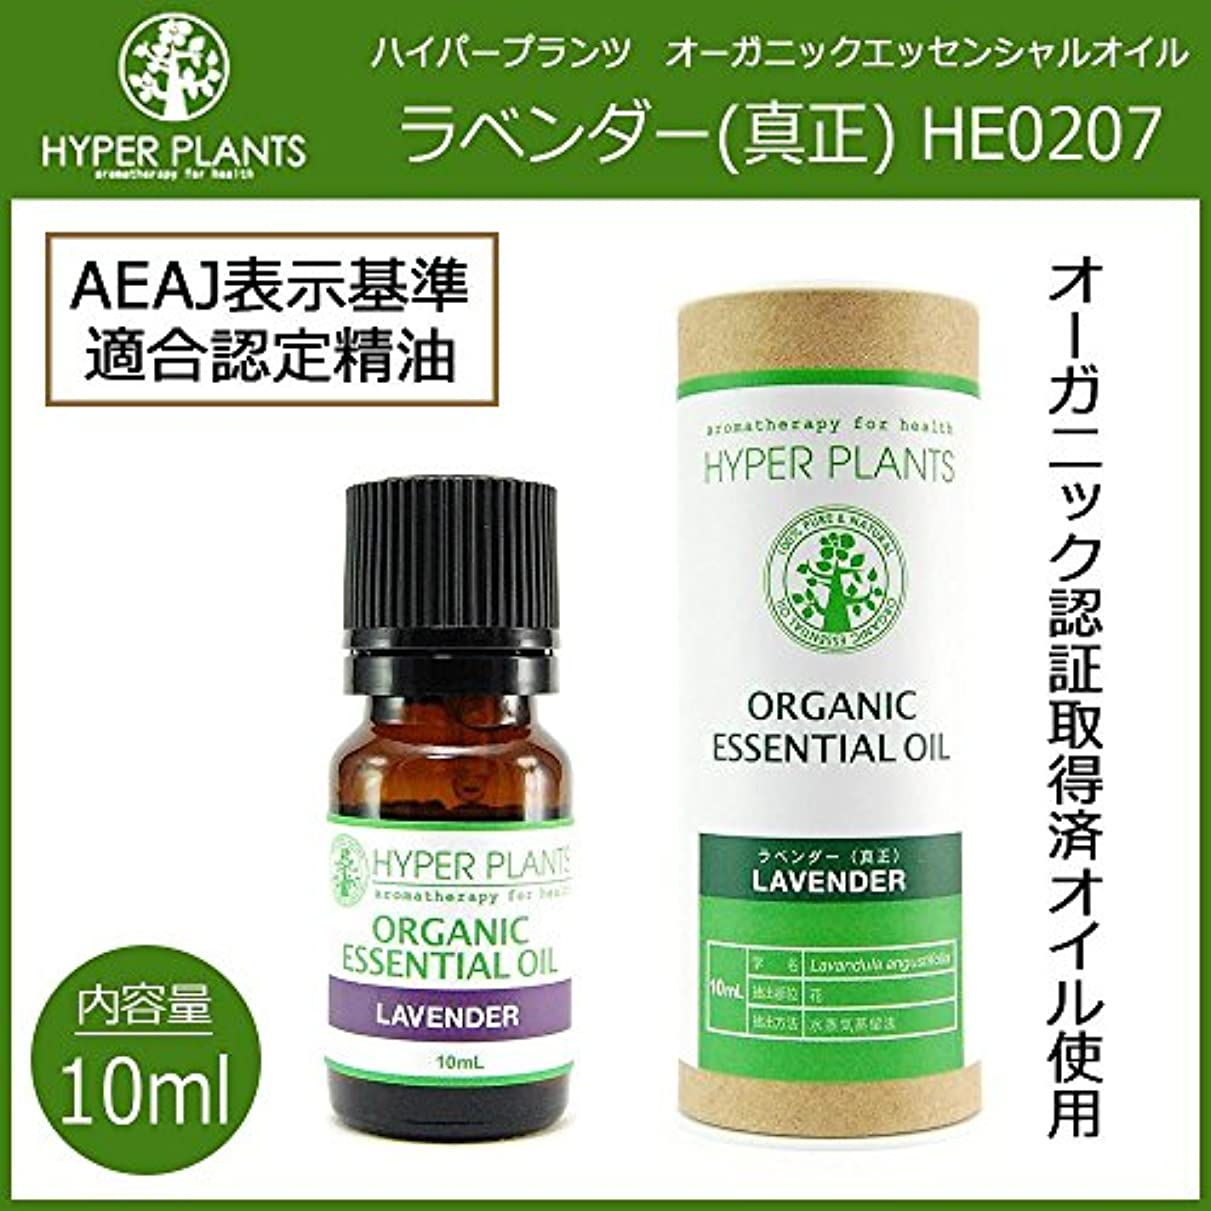 HYPER PLANTS ハイパープランツ オーガニックエッセンシャルオイル ラベンダー(真正) 10ml HE0207